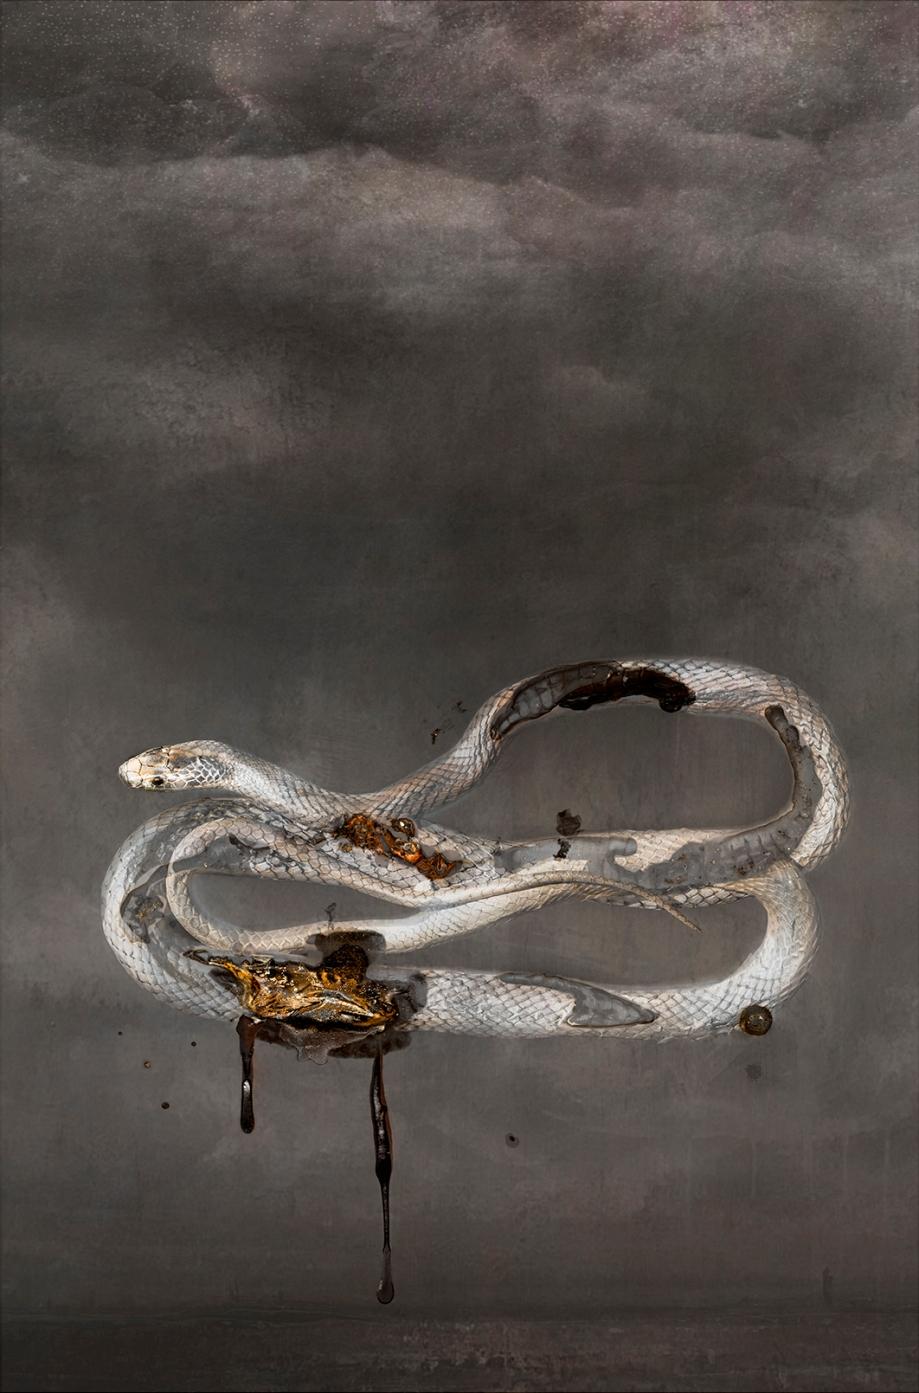 snakelittle